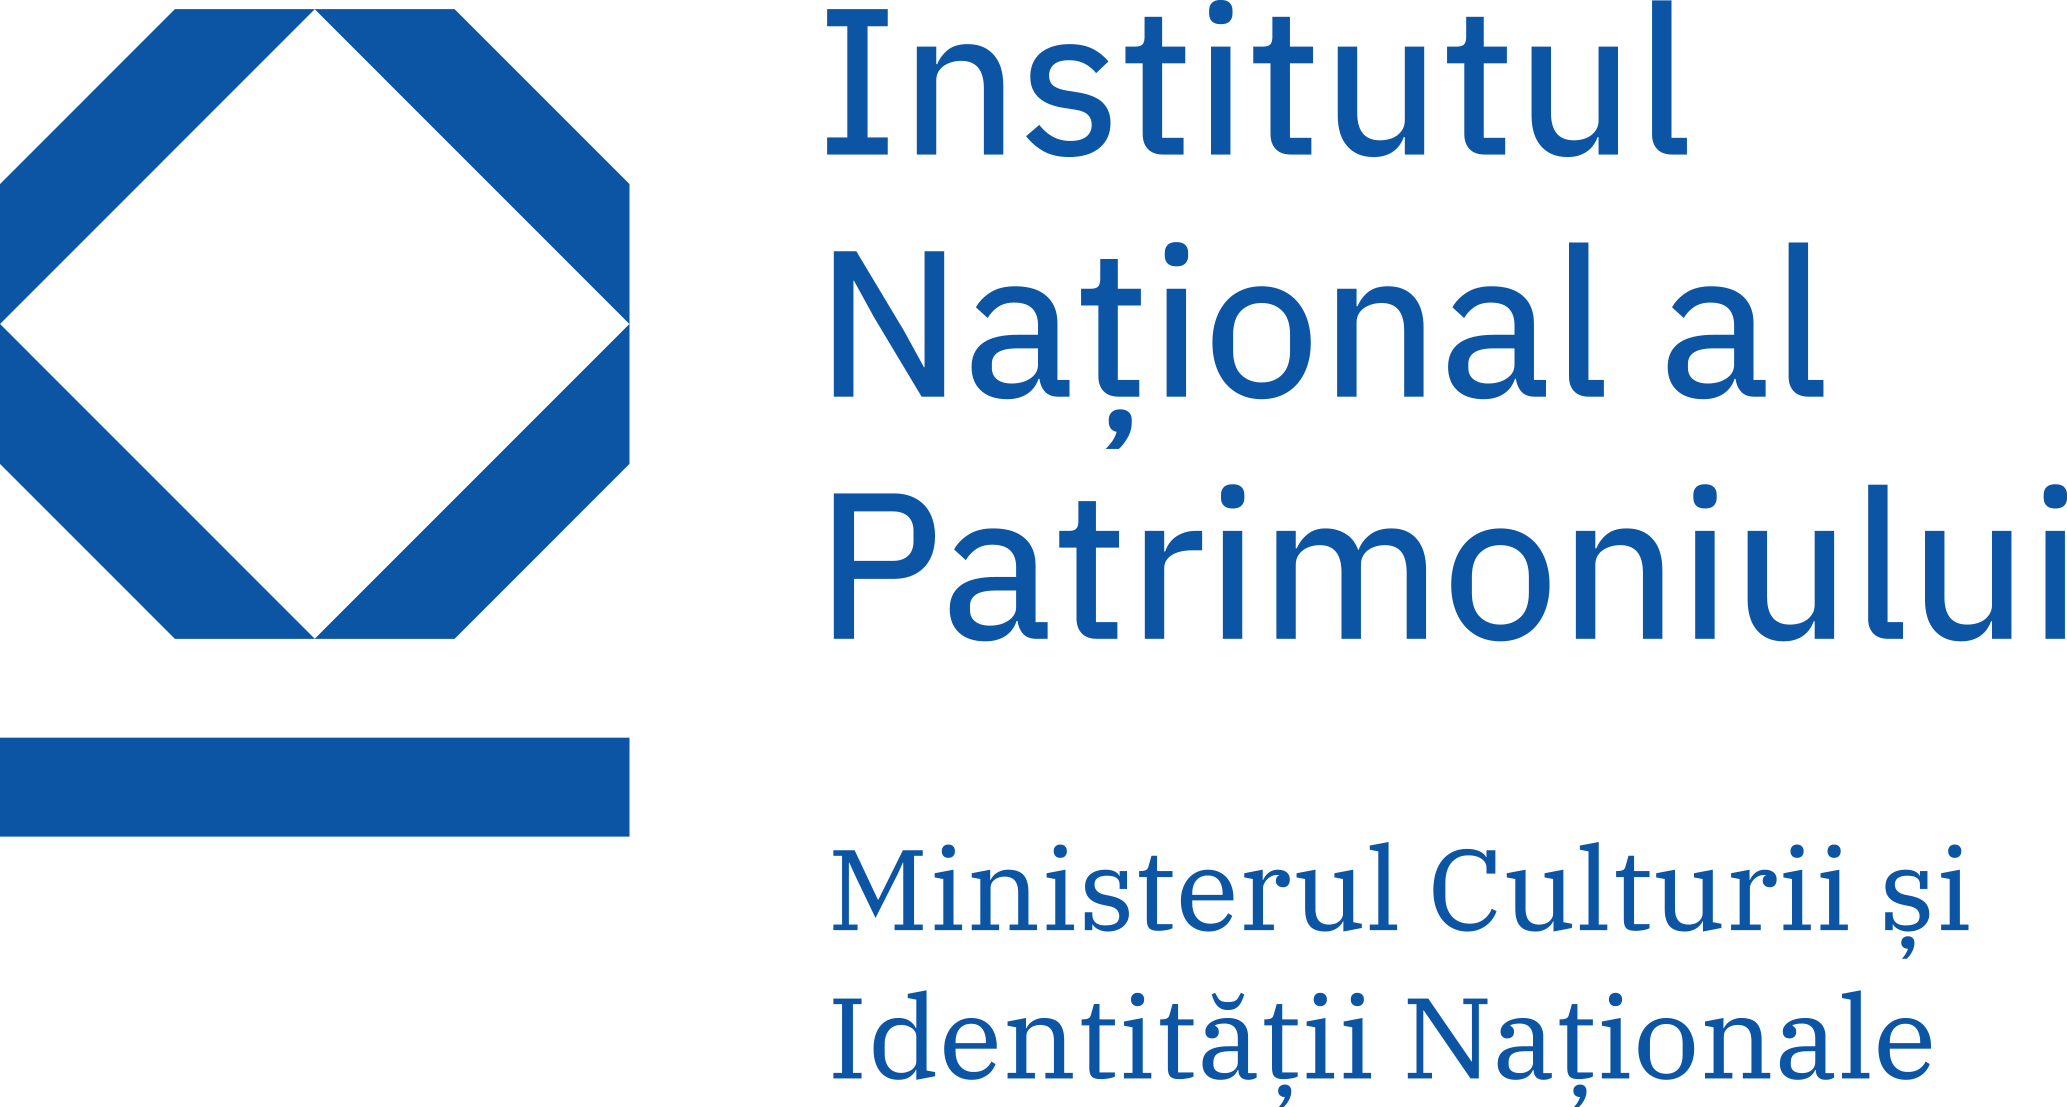 The National Heritage Institute of Romania logo